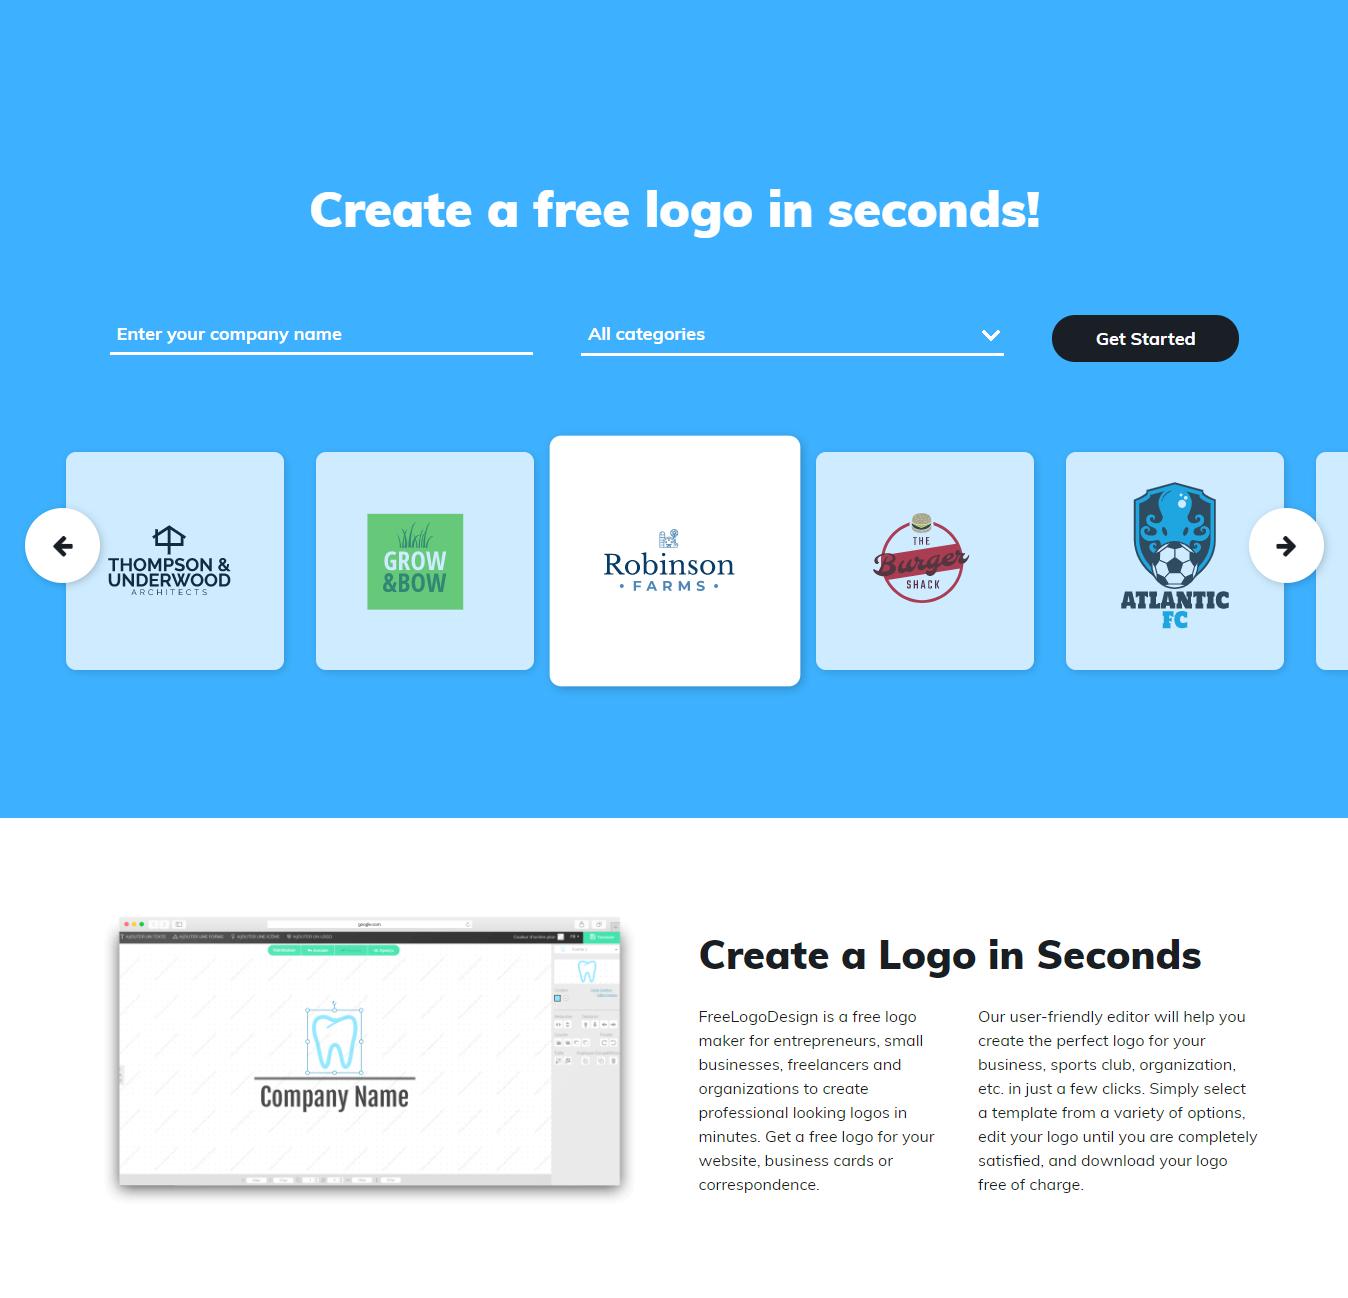 How to make free Online logo design for youtube, website or blog